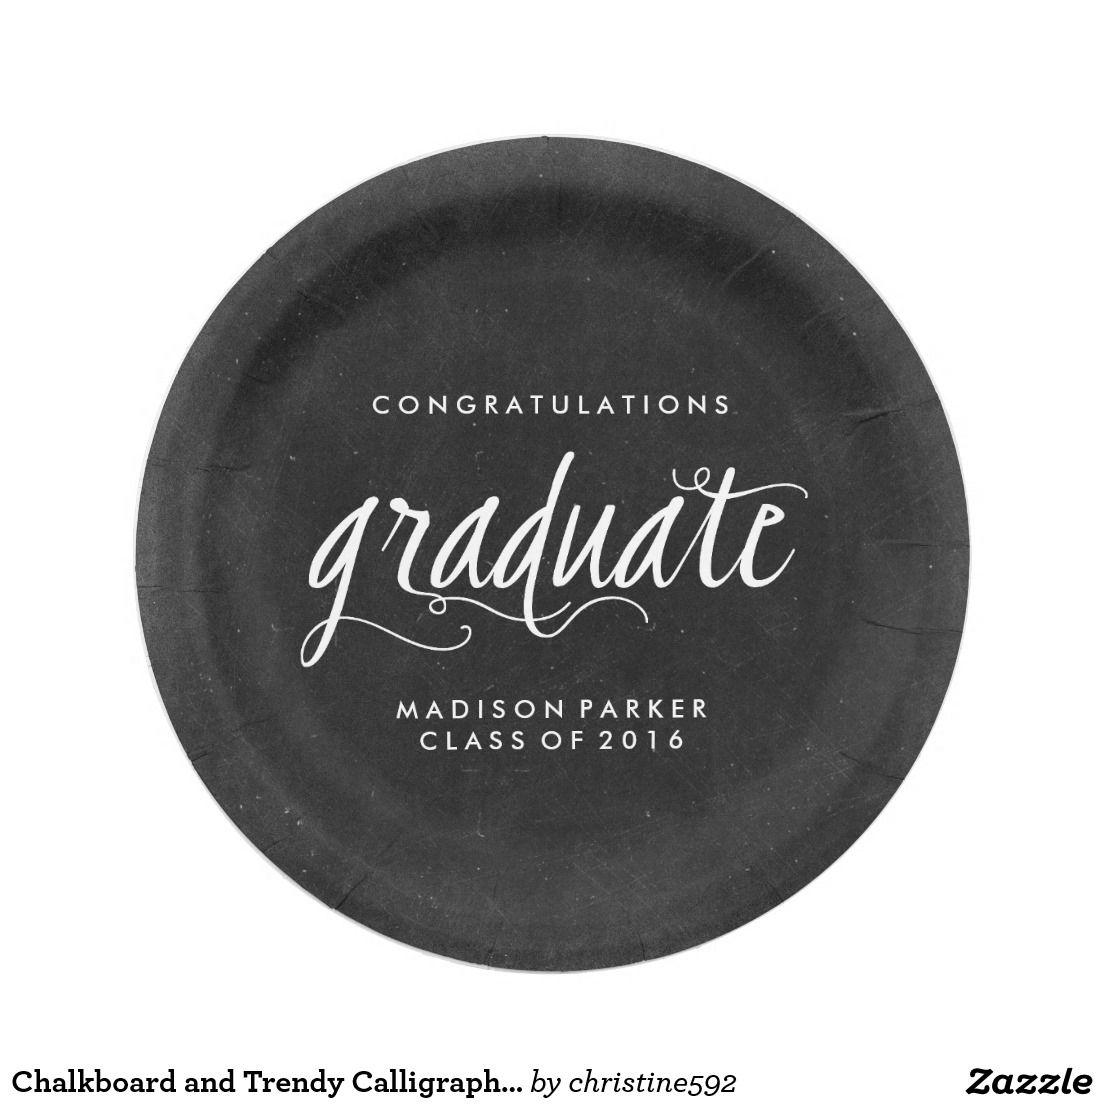 Chalkboard and Trendy Calligraphy Graduation Paper Plate  sc 1 st  Pinterest & Chalkboard and Trendy Calligraphy Graduation Paper Plate   Stuff ...